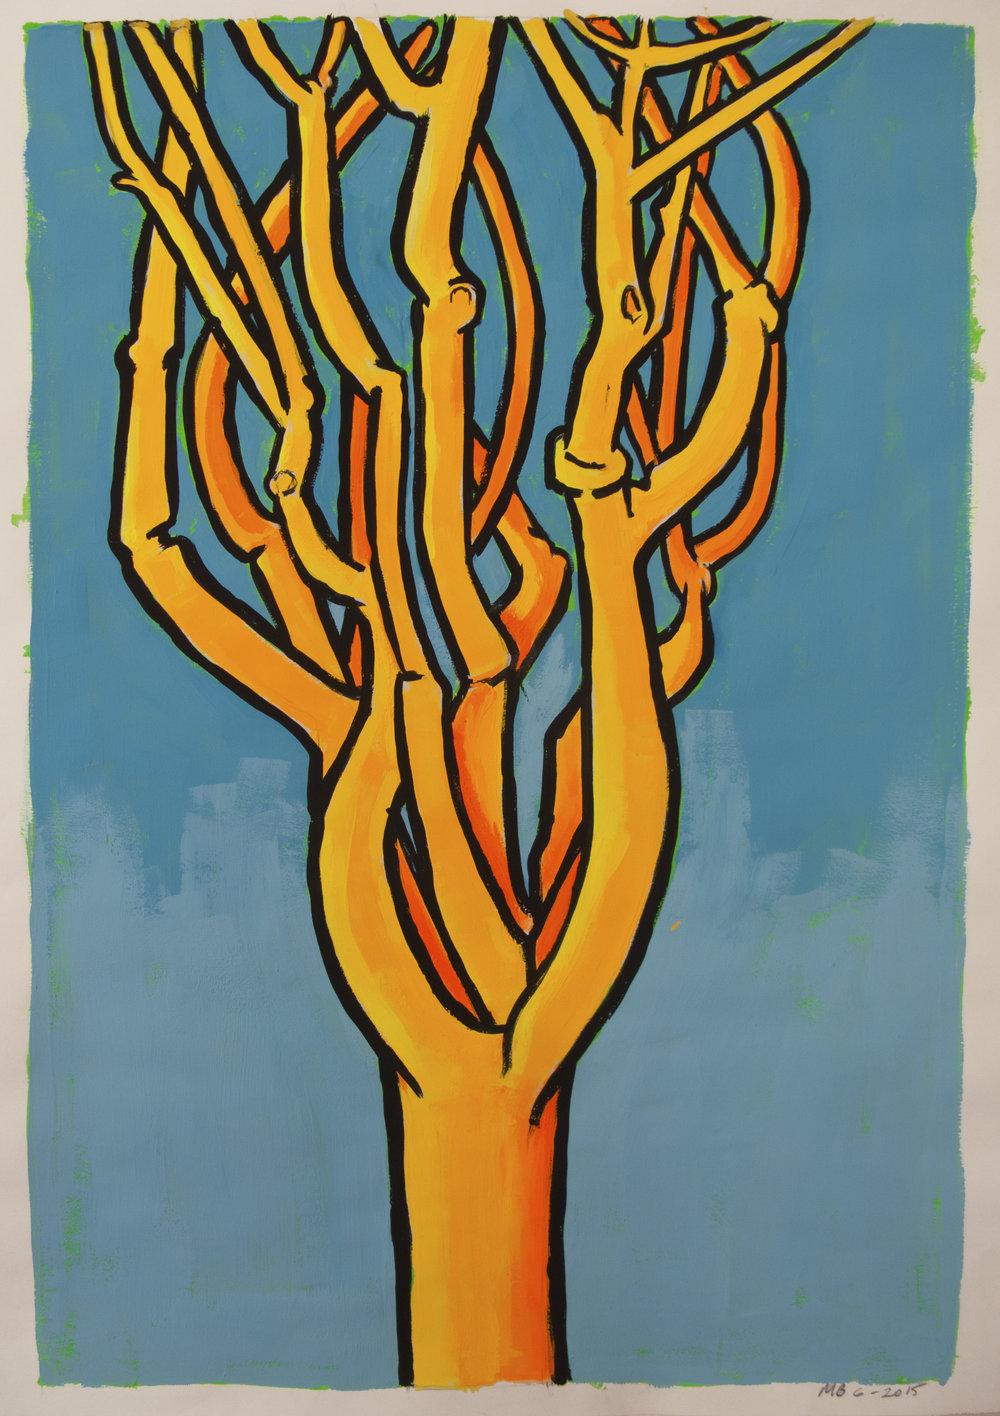 Orange Pine (Blue Sky) , 24 x 19 inches, gouache, 2016